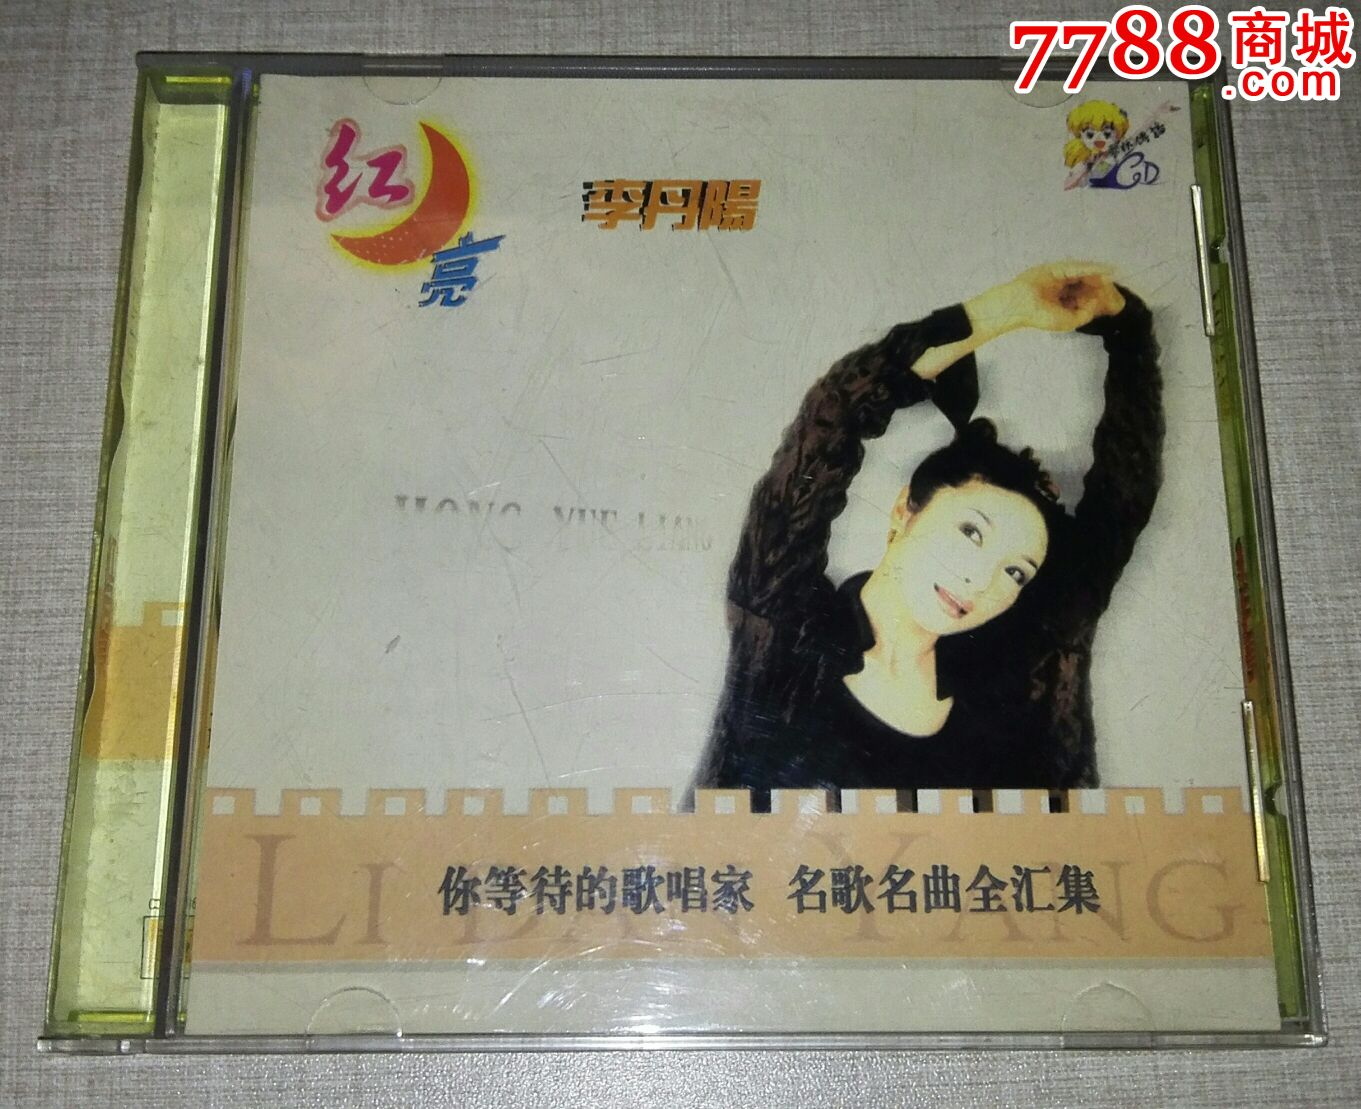 李丹�《�t月亮》白天�Z影音CD(au13849221)_